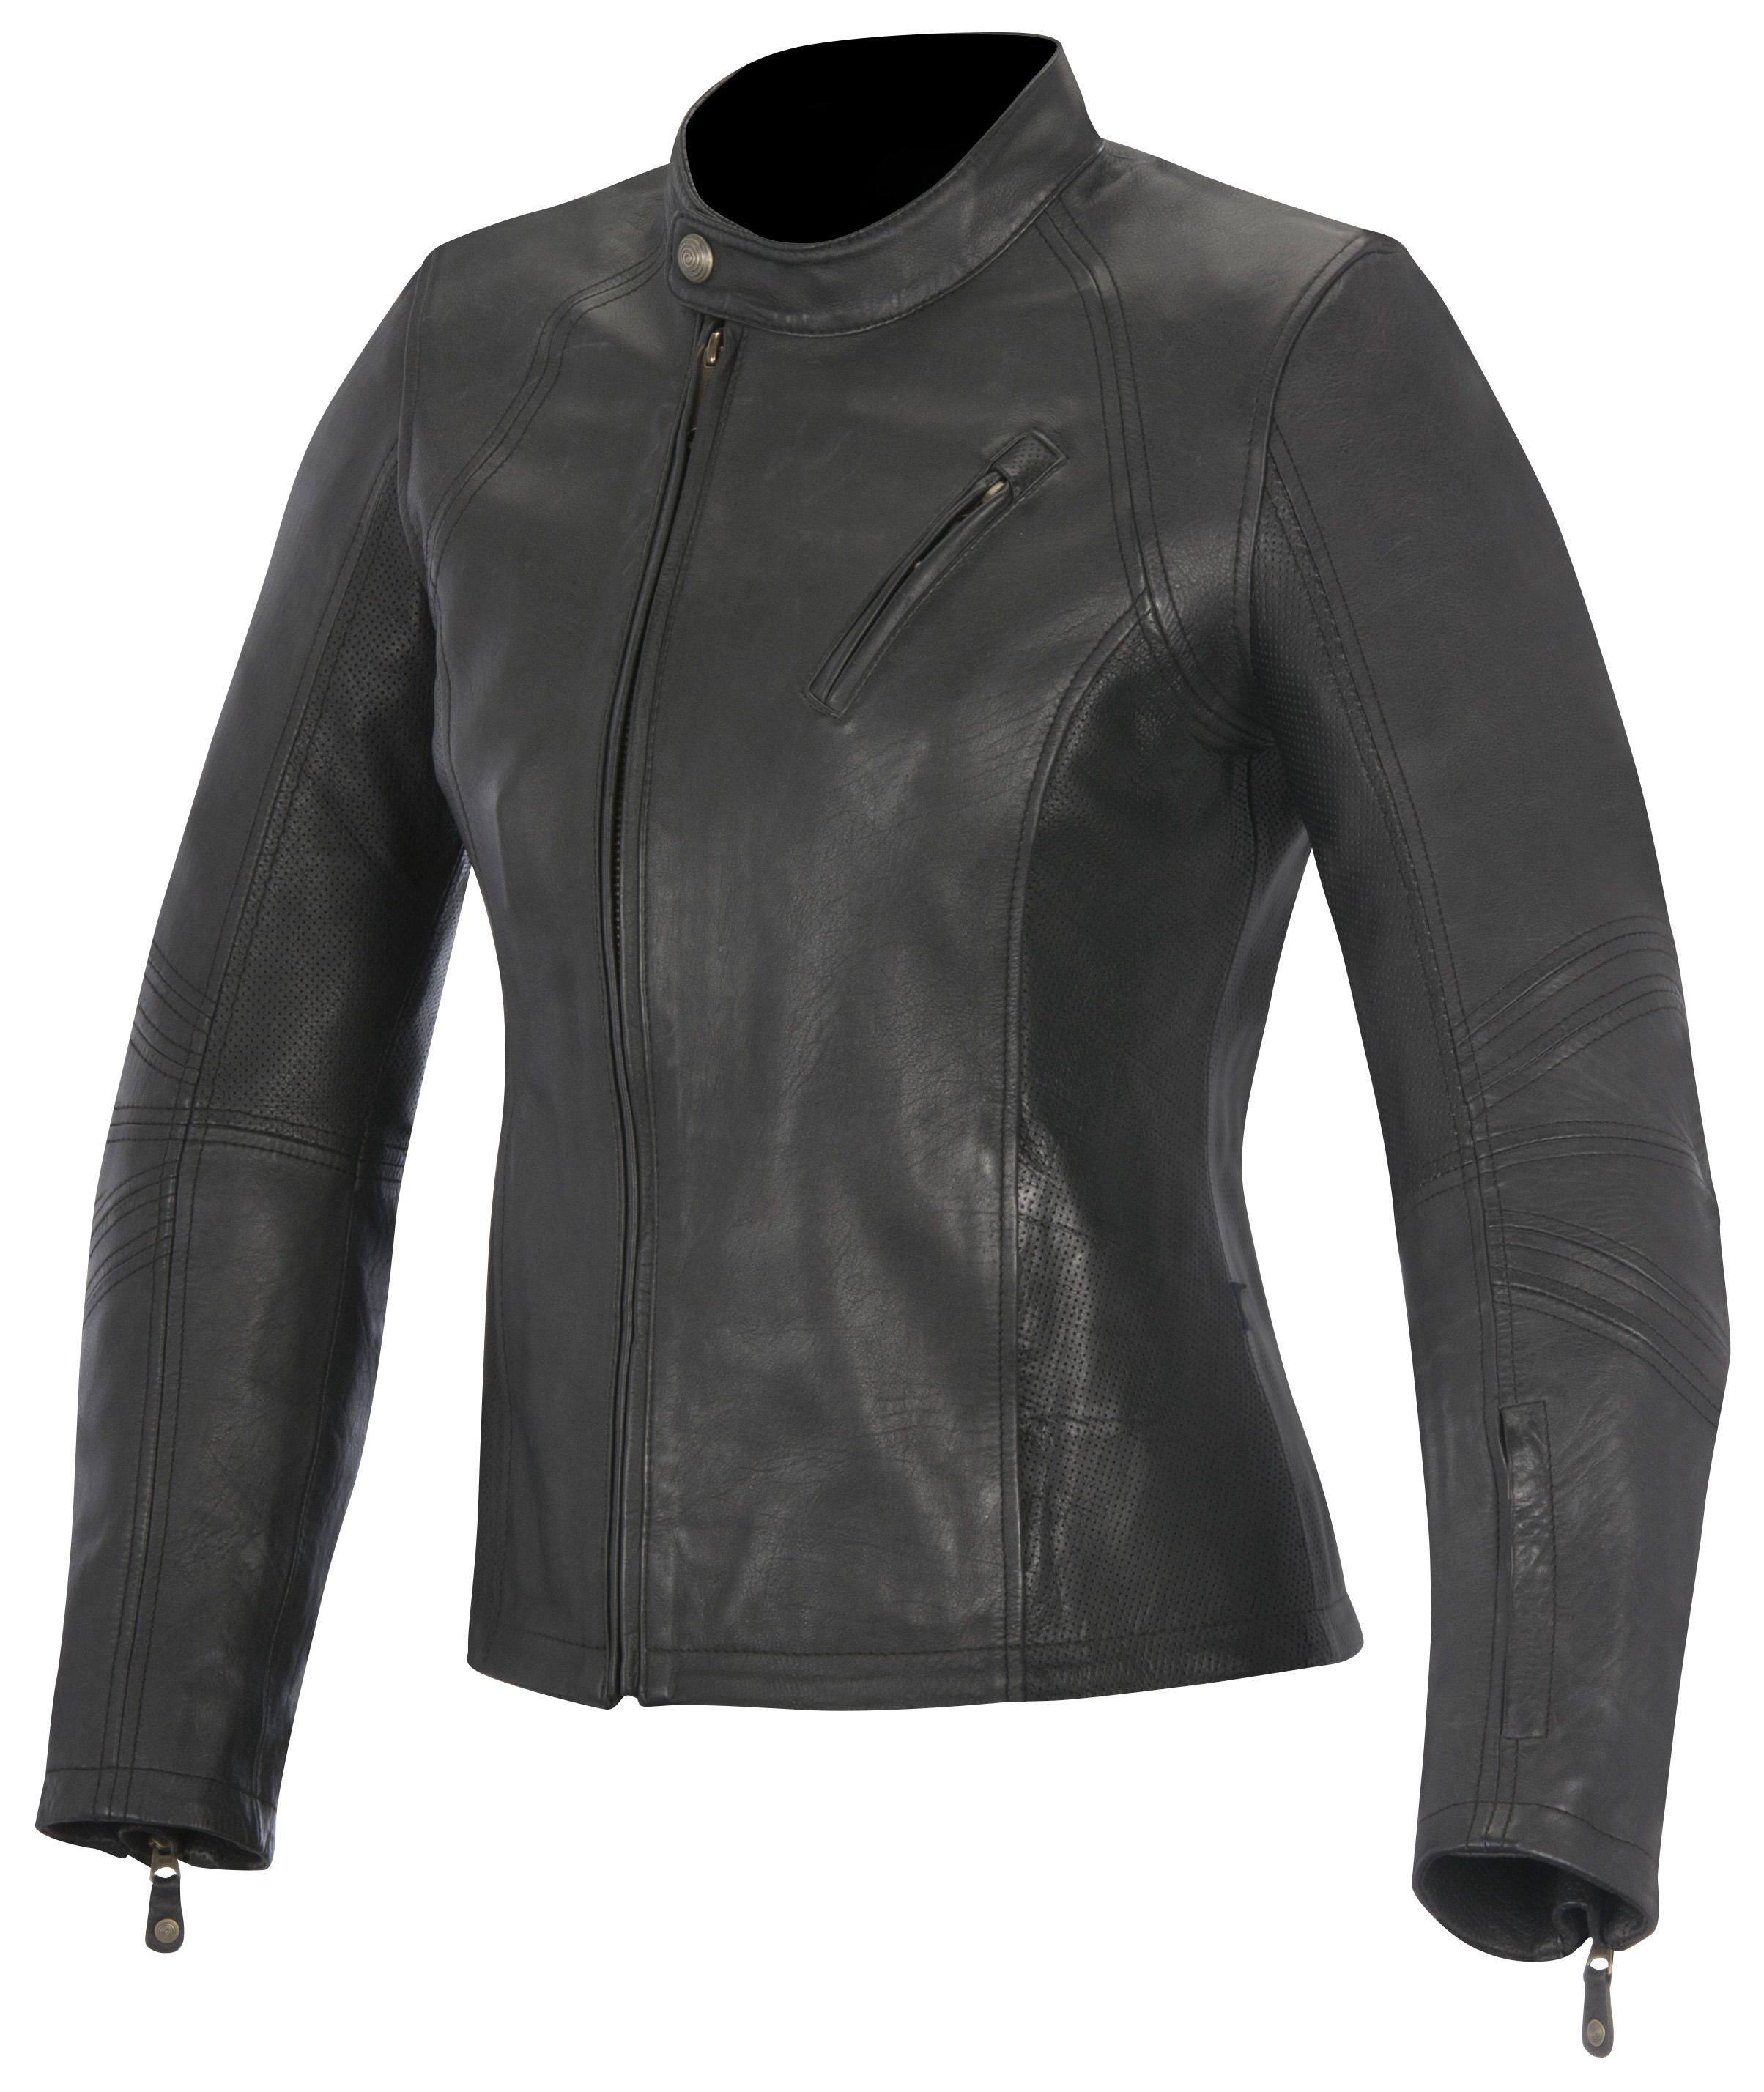 Leather jacket women - Leather Jacket Women 45